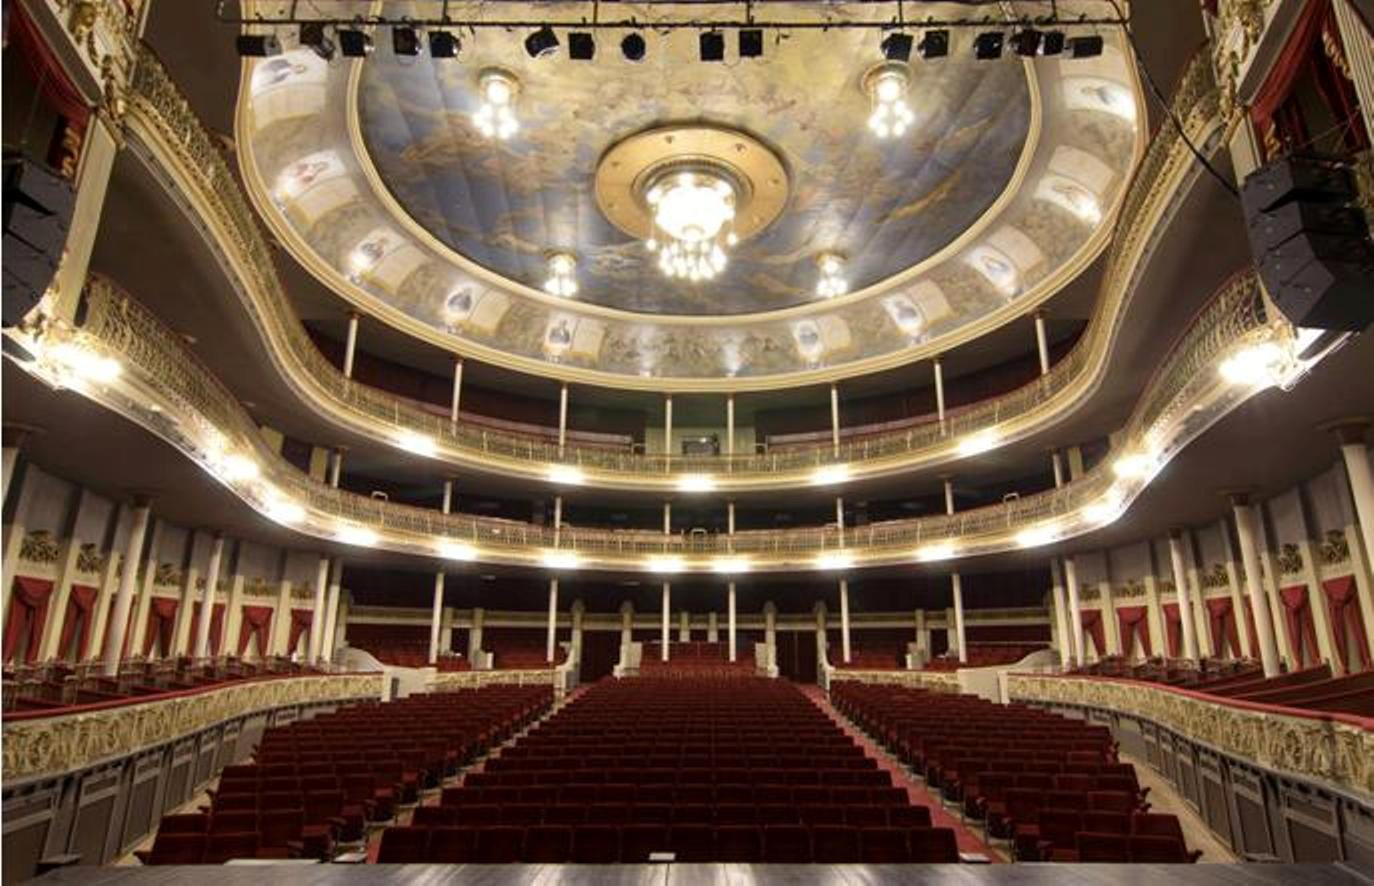 Arjantin, Buenos Aires Teatro Coliseo (Coliseo Tiyatrosu)